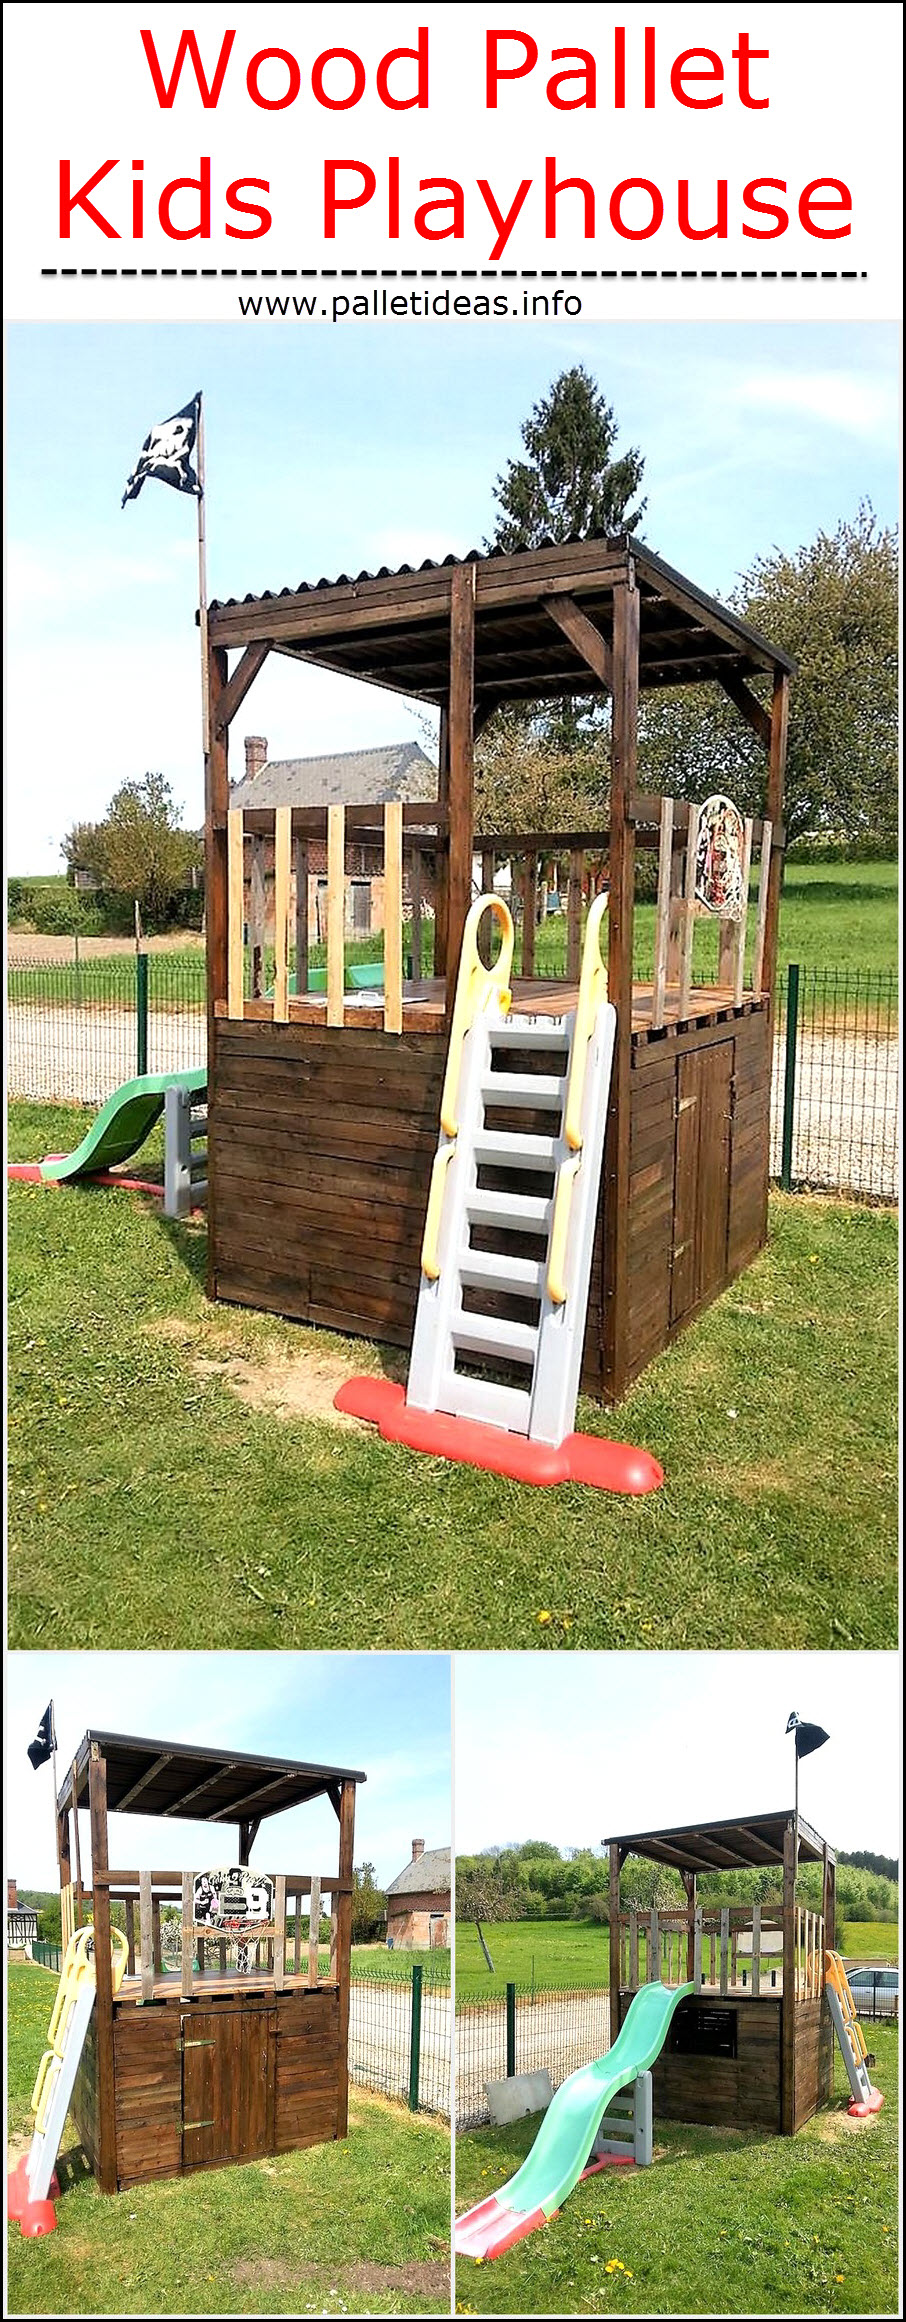 wood-pallet-kids-playhouse